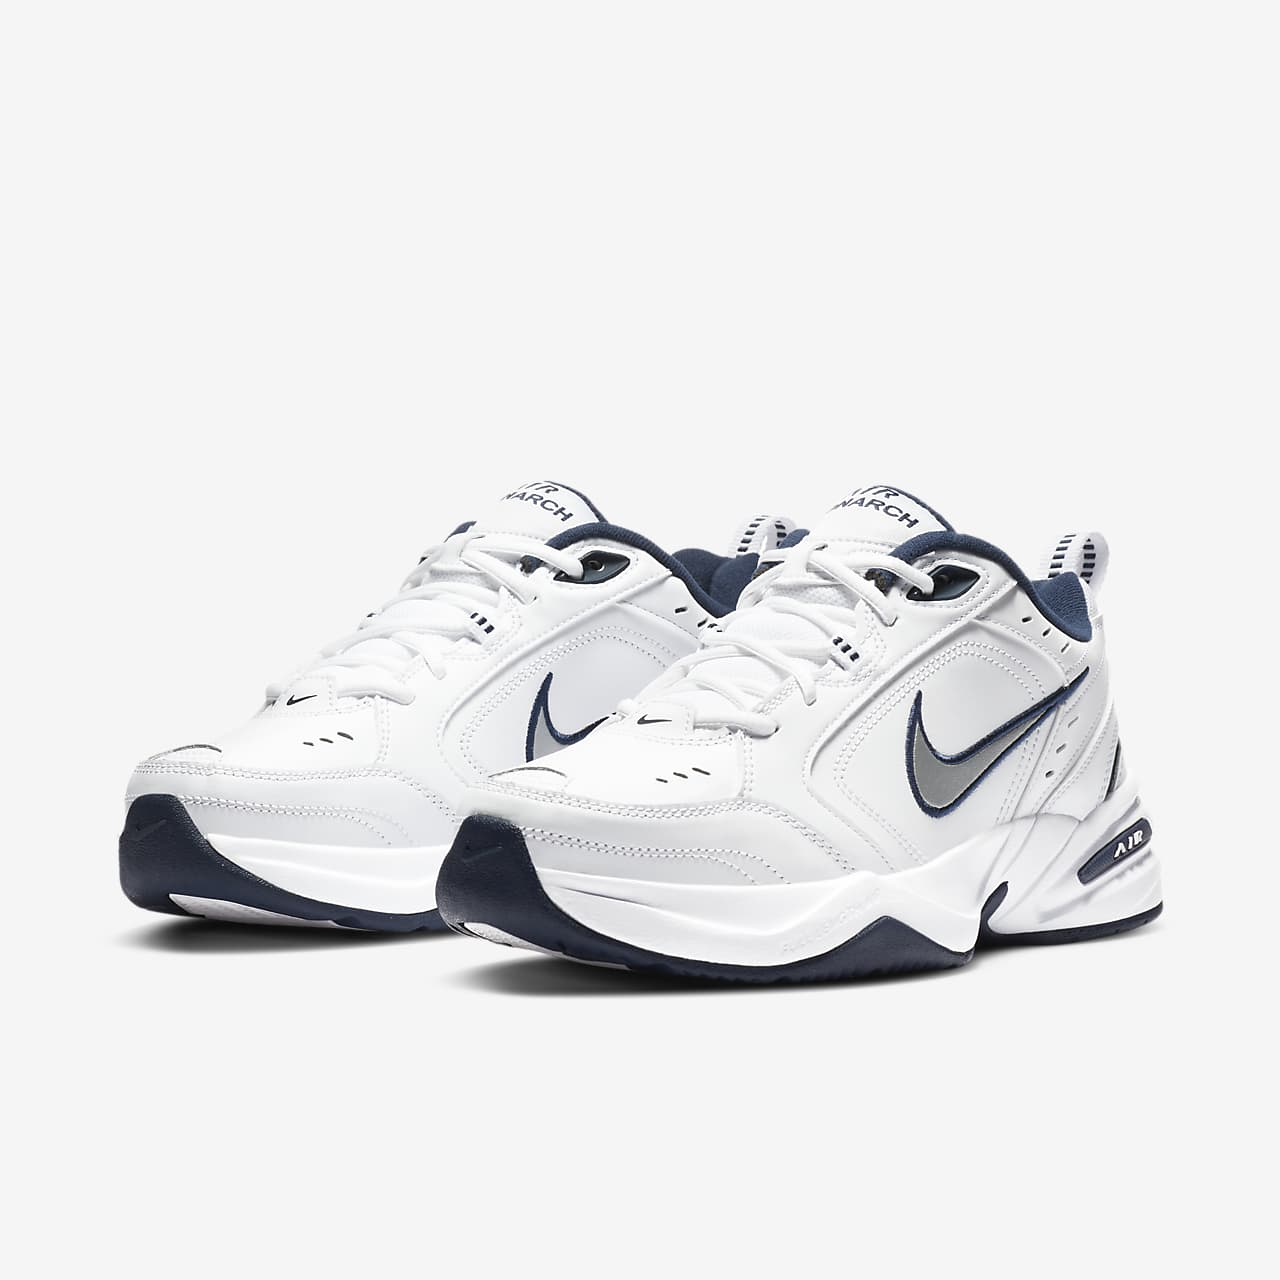 pretty nice 0ae17 b1afa ... Chaussure de fitness et lifestyle Nike Air Monarch IV